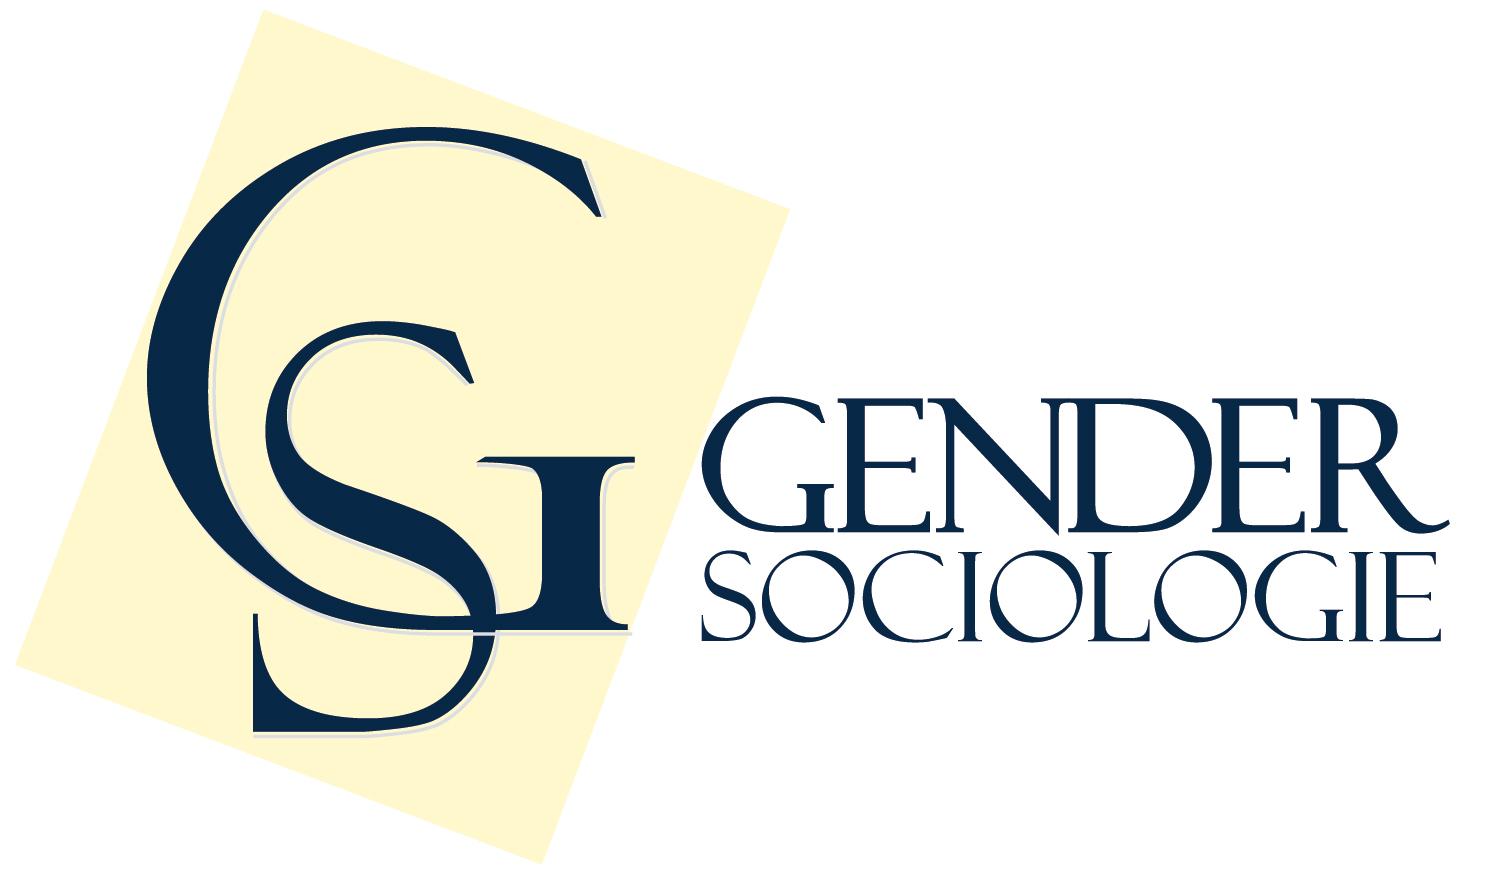 gender sociologie